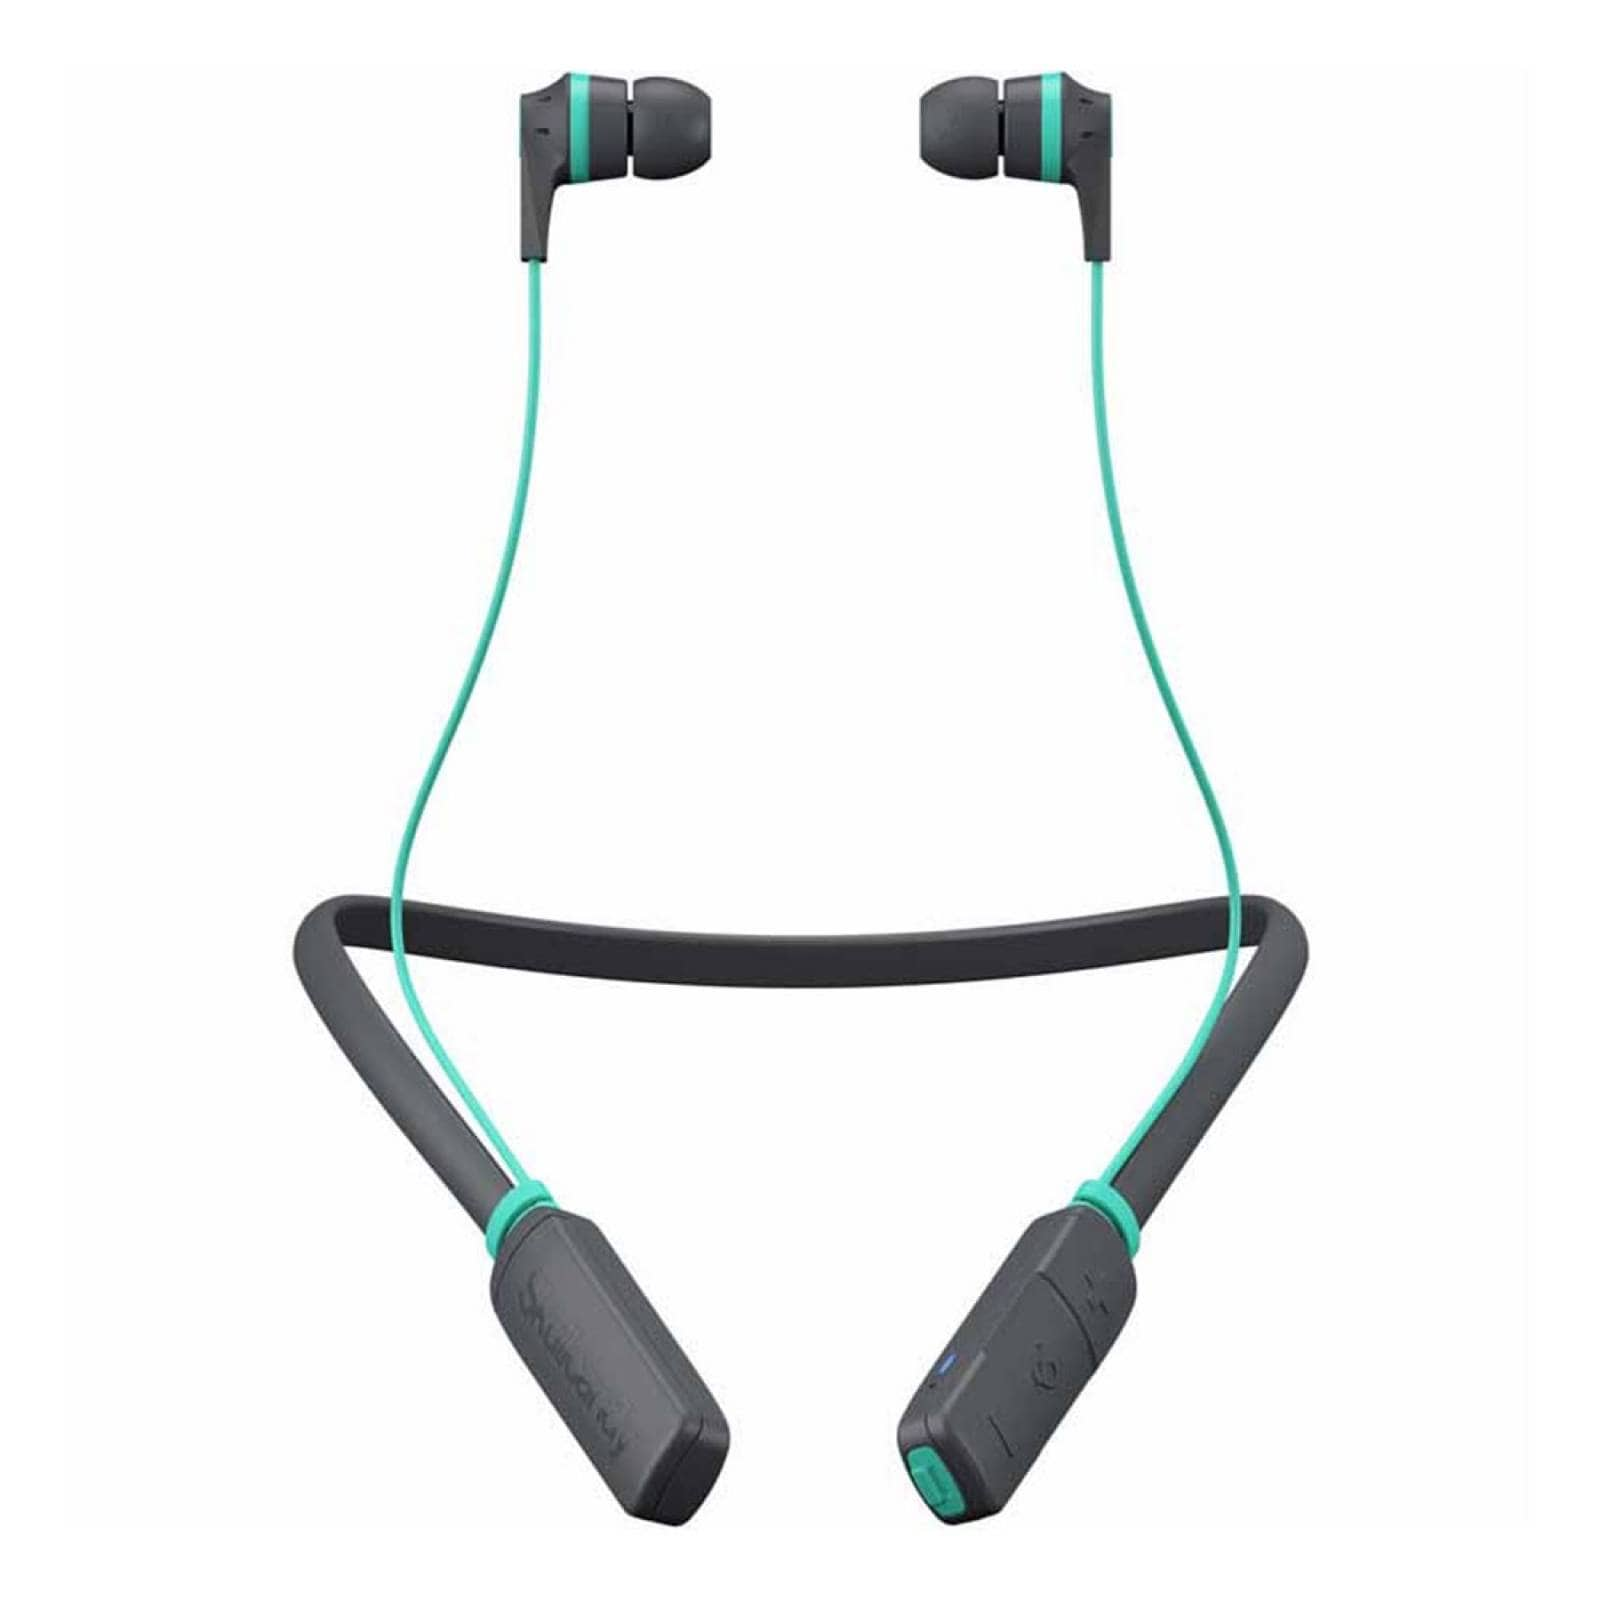 Audífonos Inalámbricos Ink´d Micrófono Wireless Skullcandy